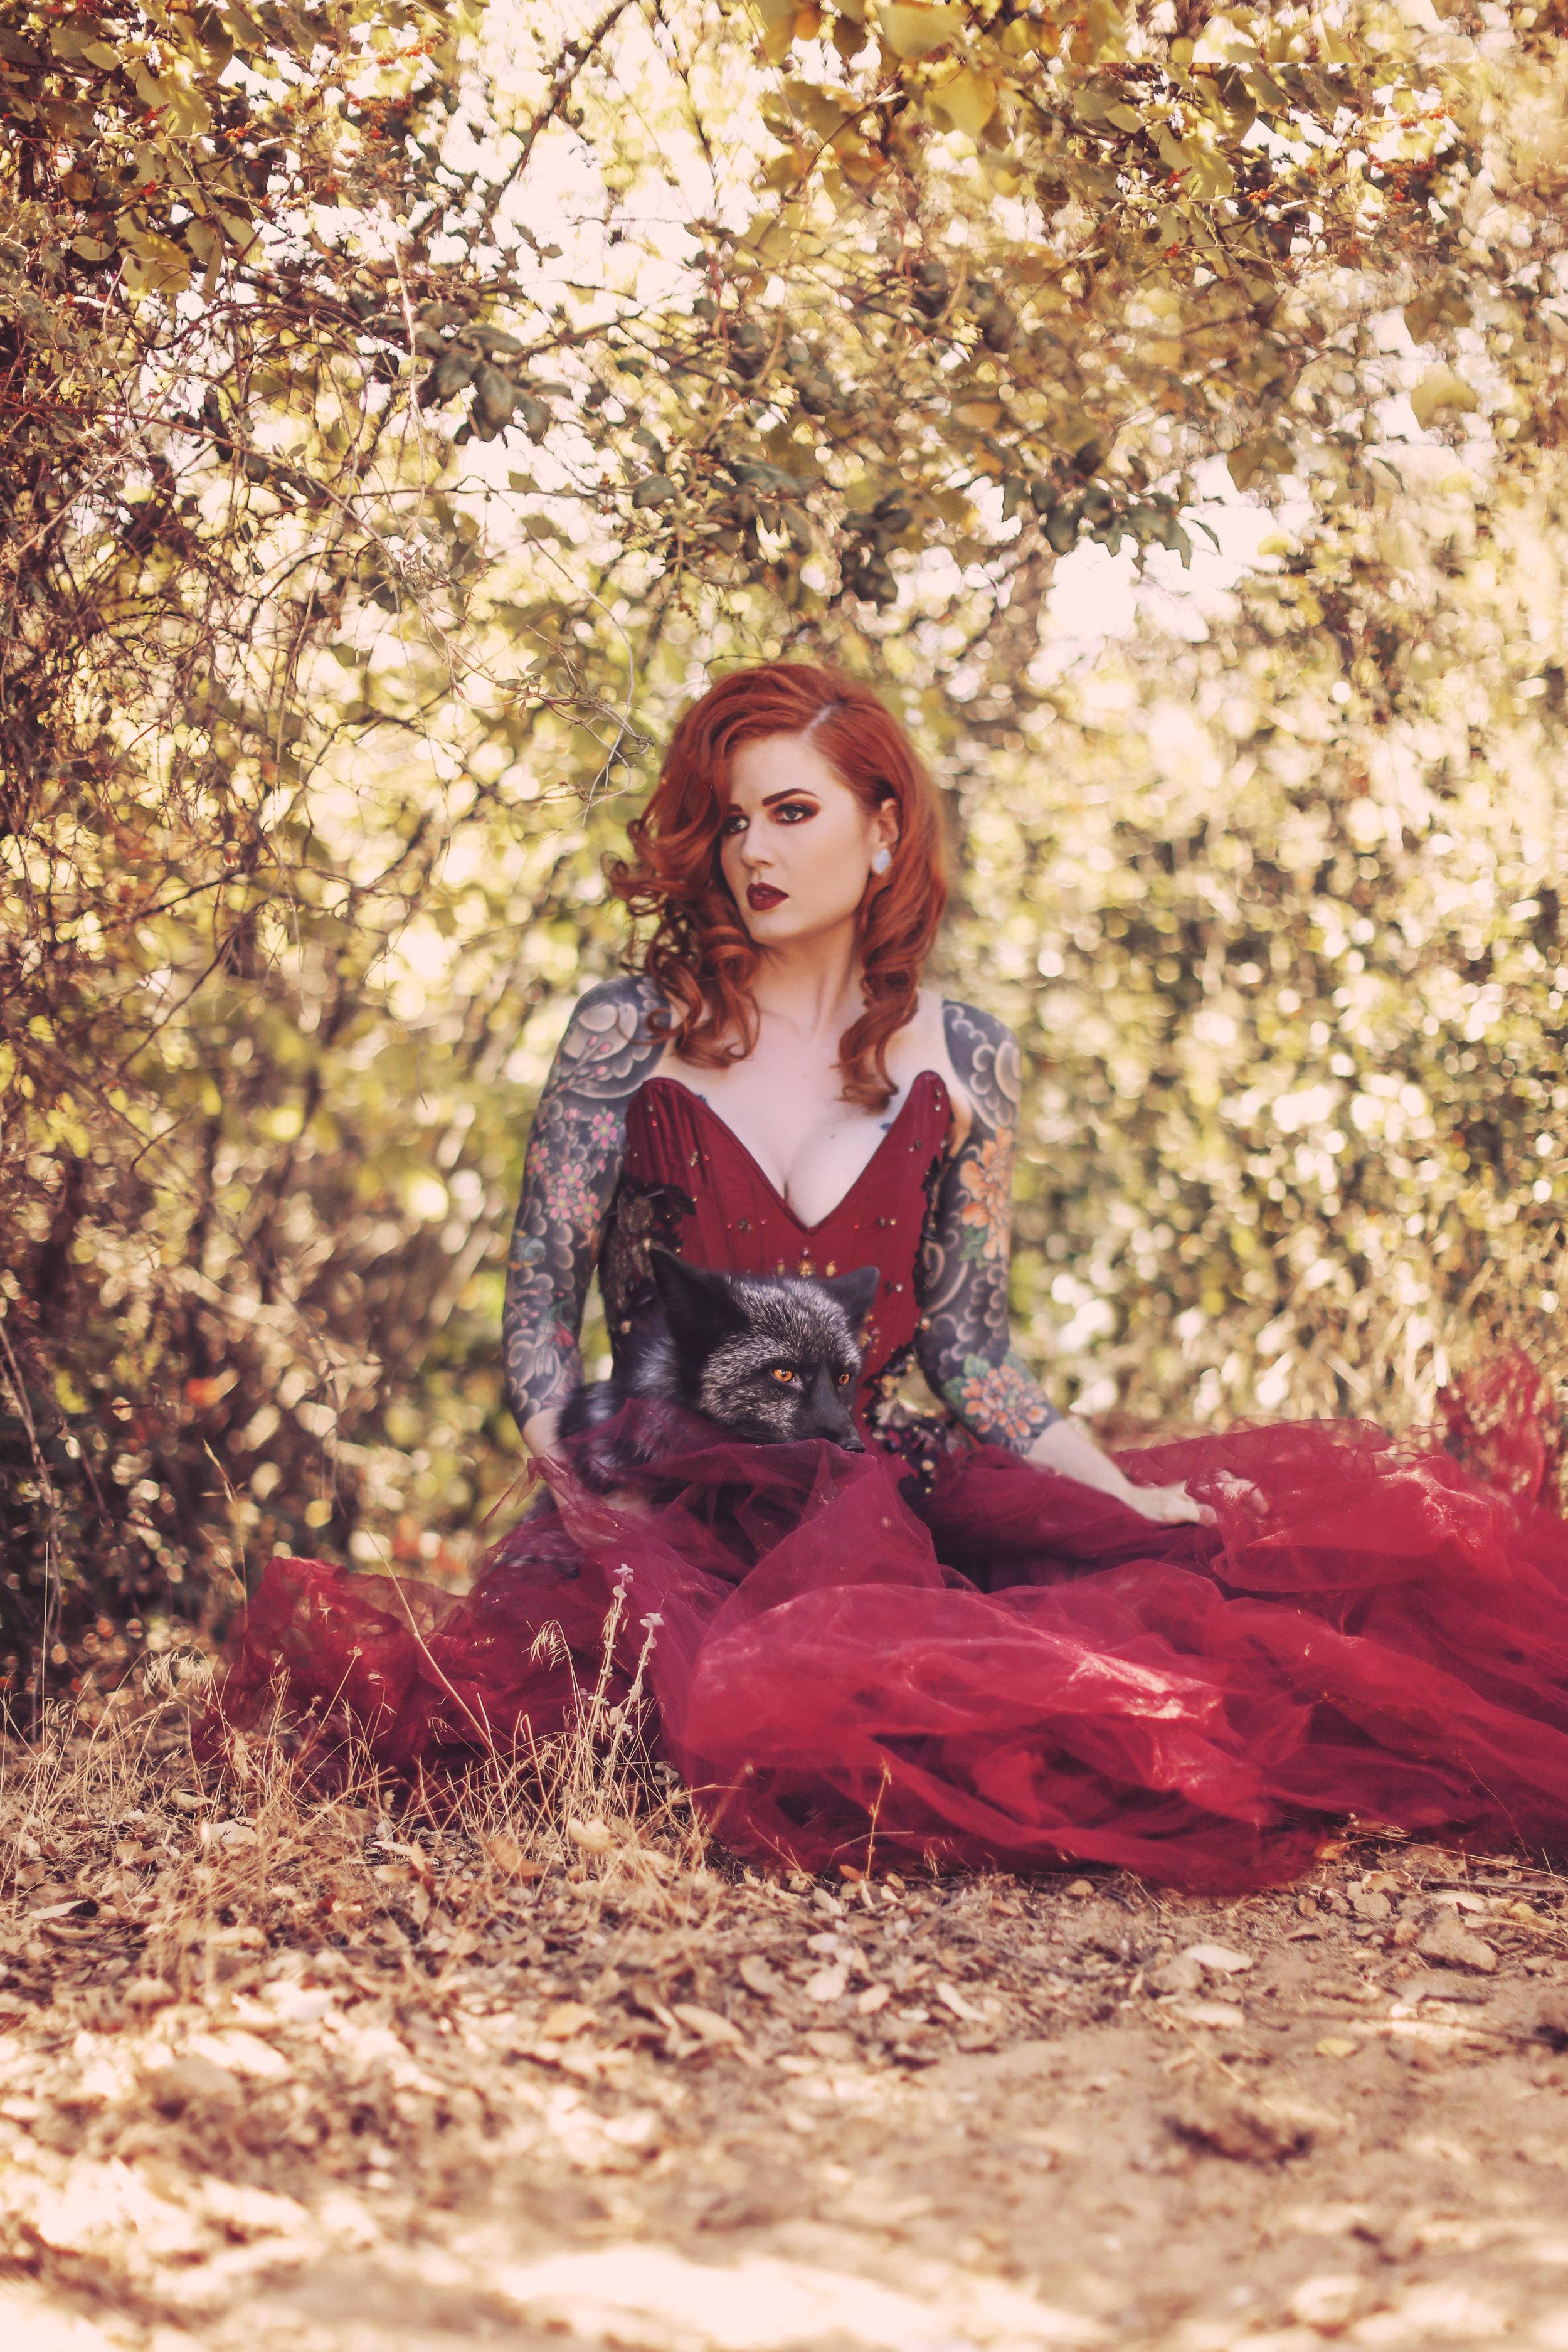 Photo courtesy of Anabel DeFlux; Model: Luna Marie